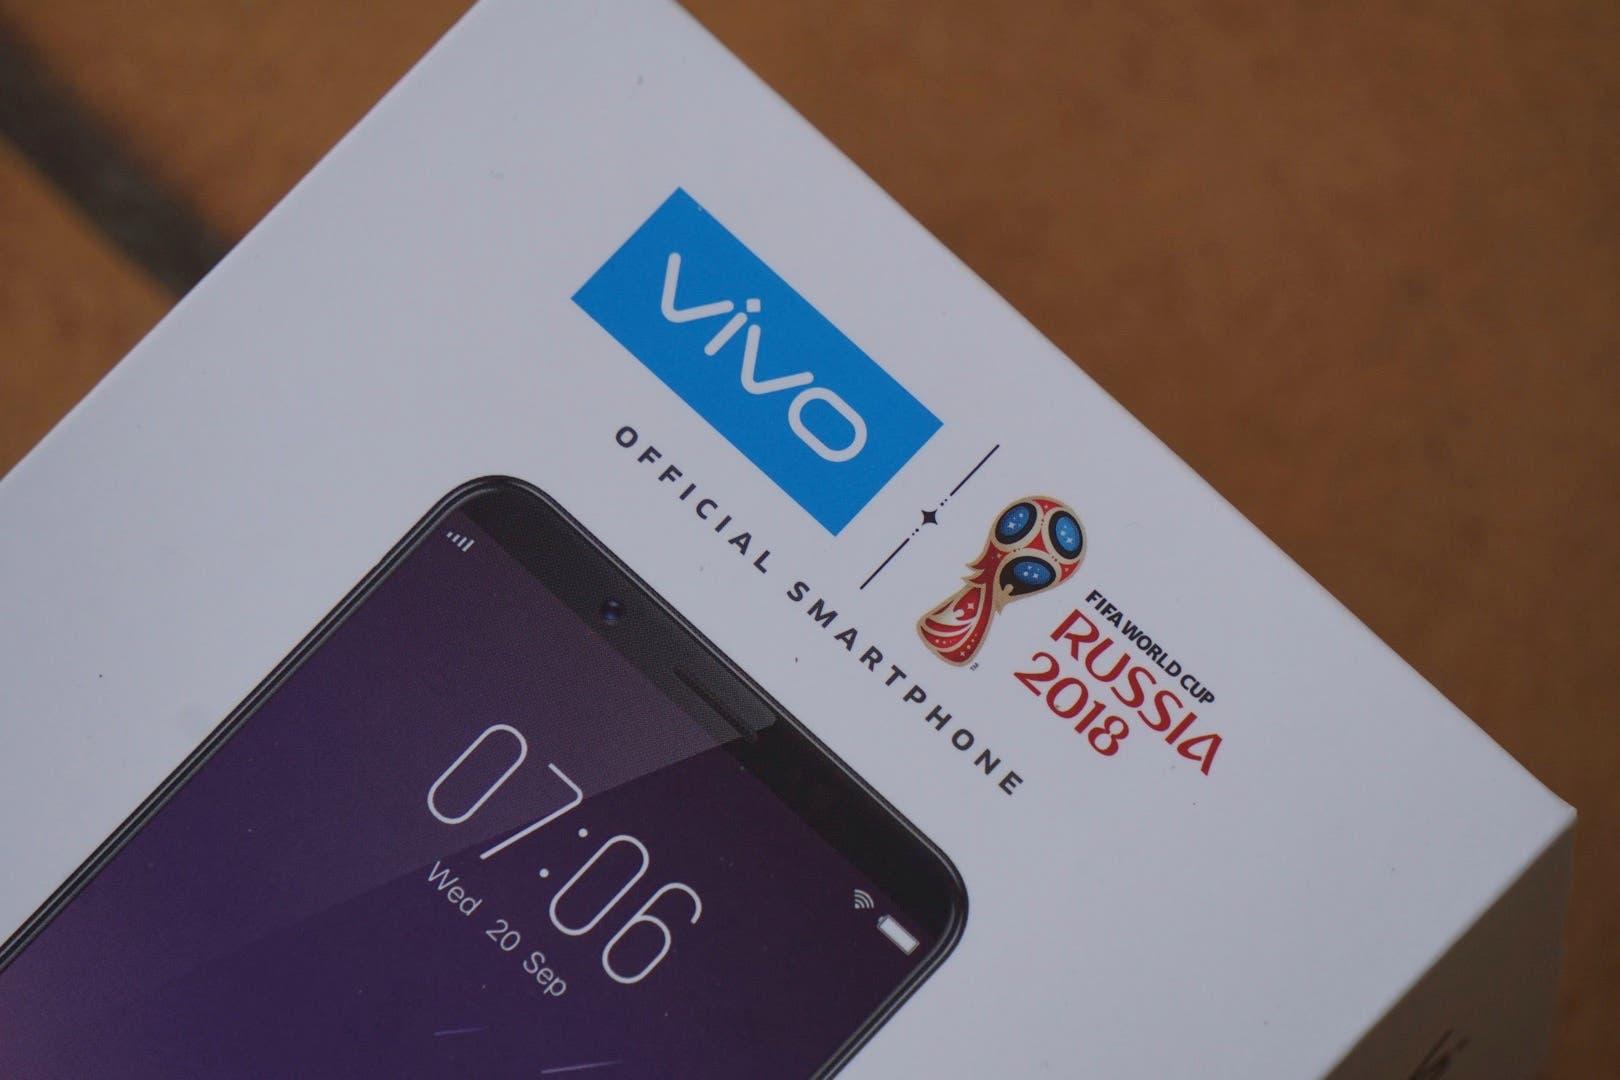 Vivo V7+ Russia 2018 Title Sponsor